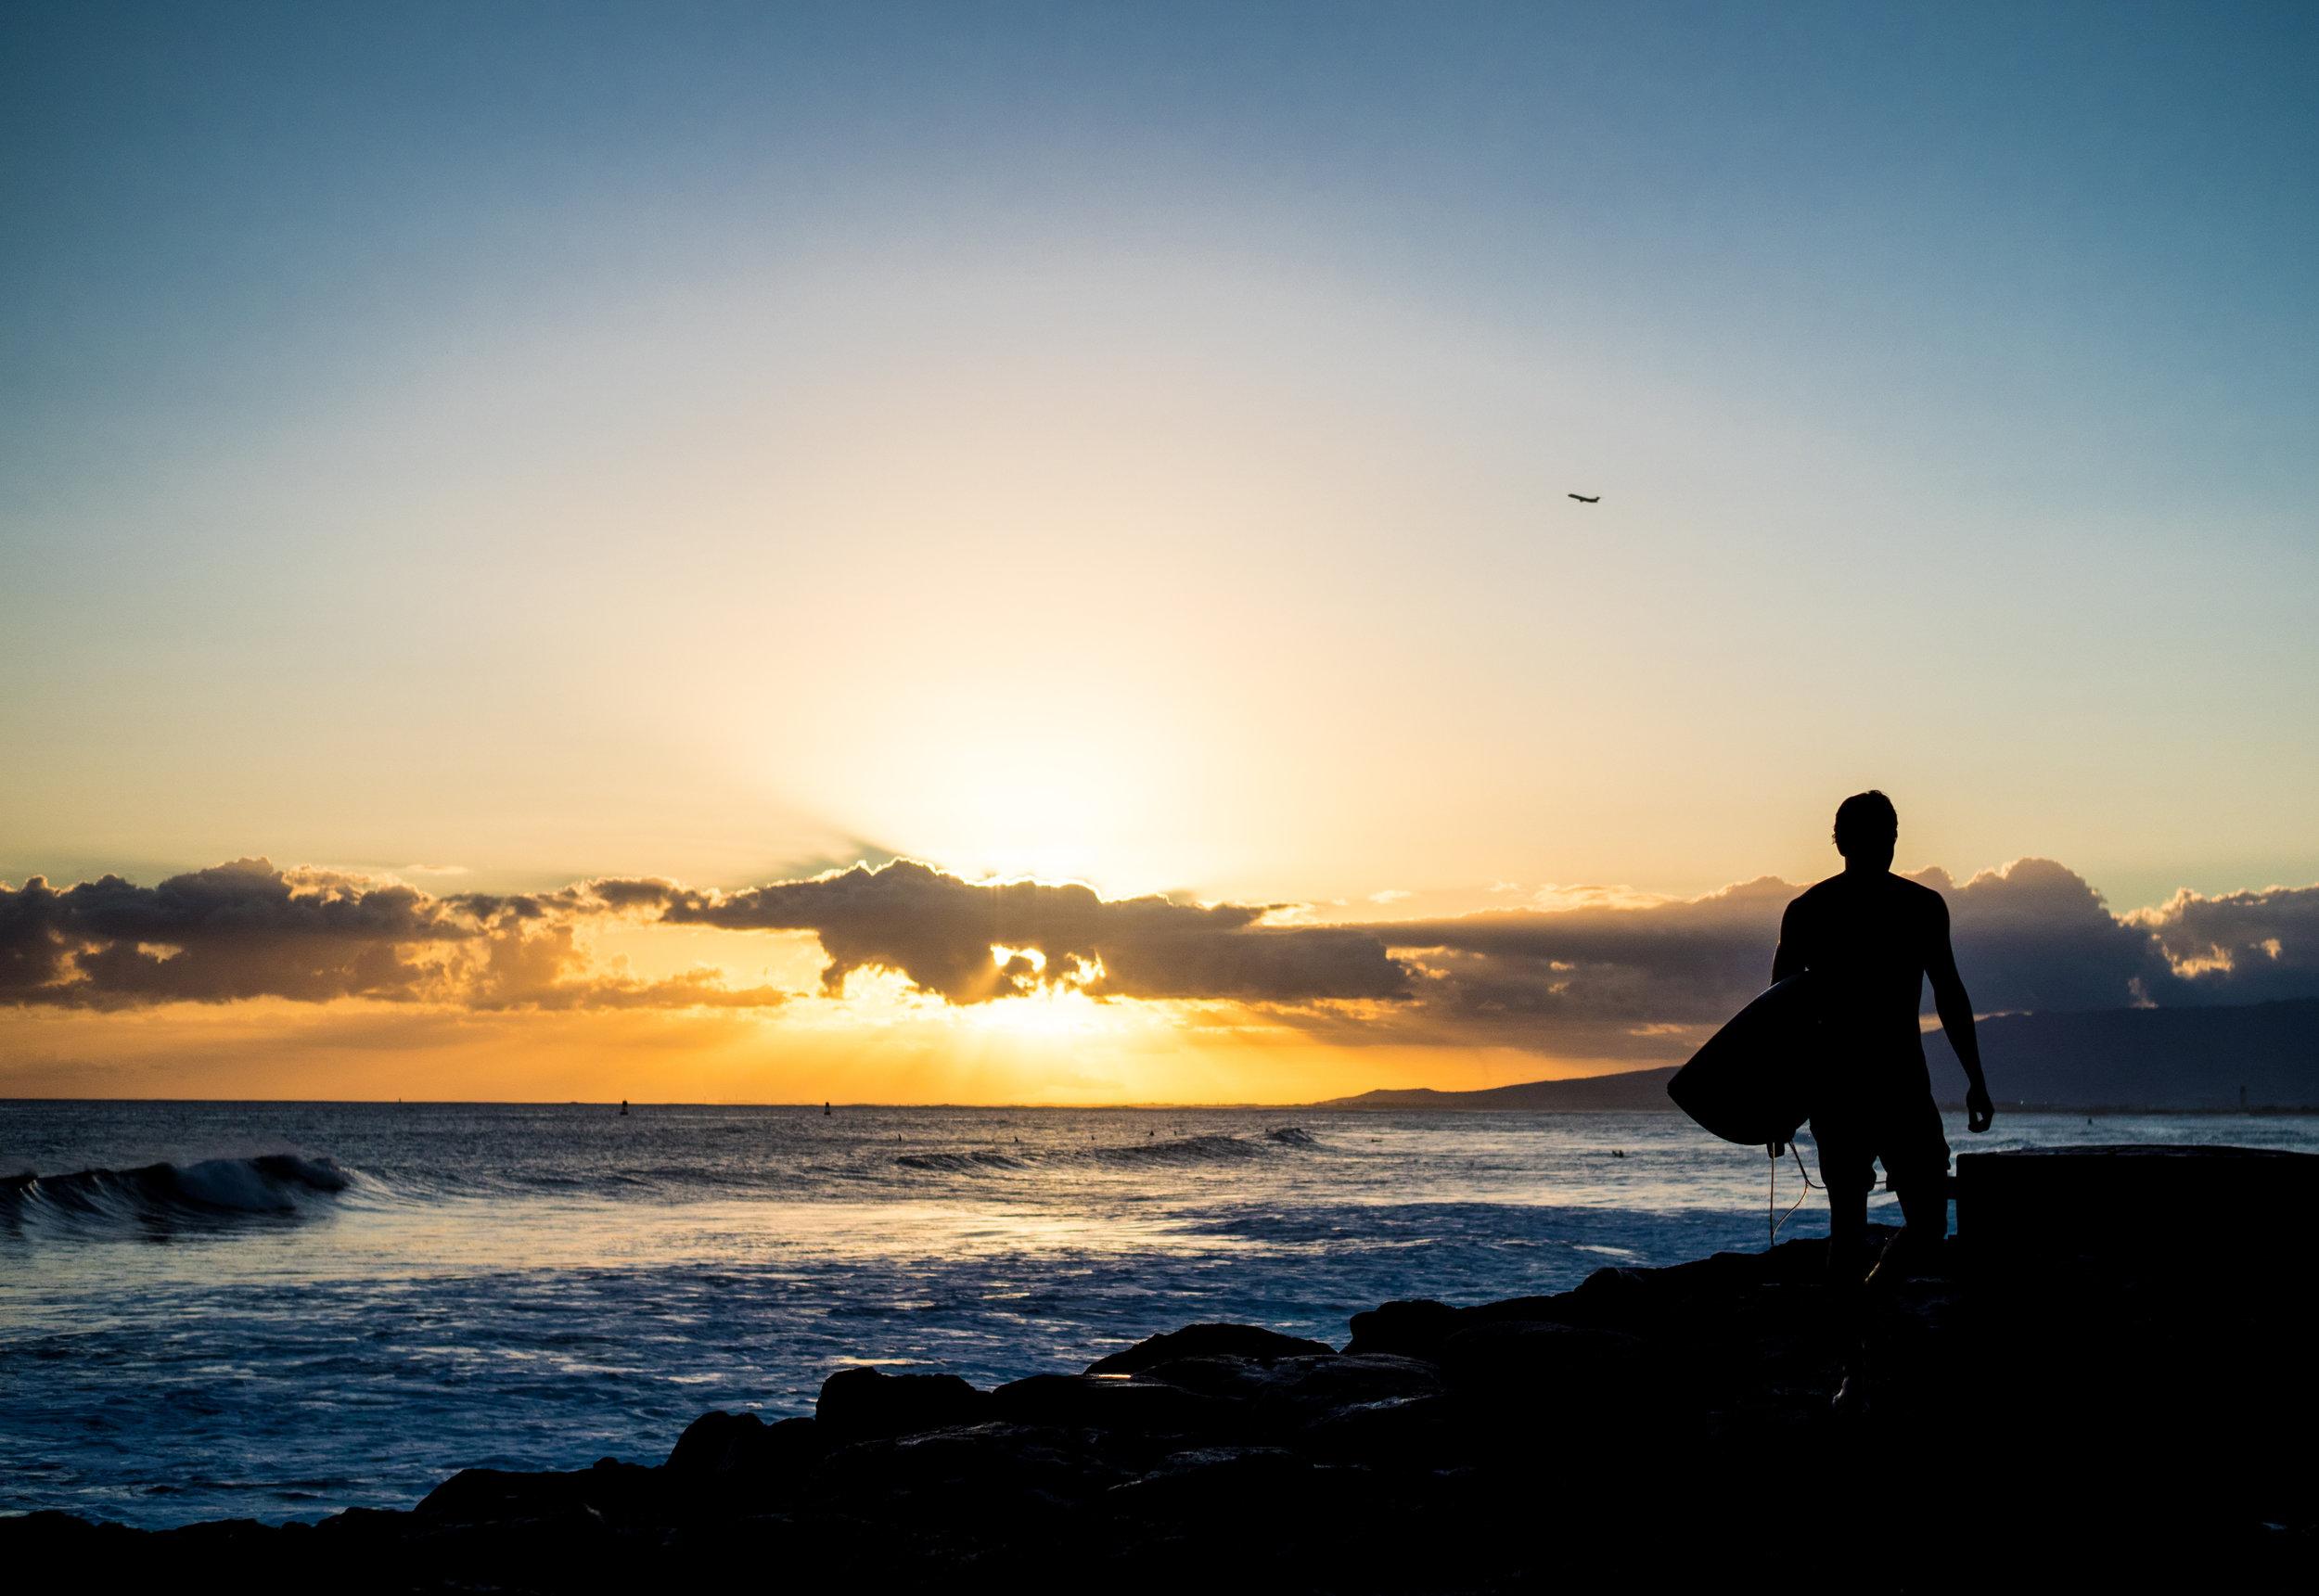 Musings by the Surf - Sunset Surf at Kaka'ako Waterfront Park, Honolulu, Hawaii